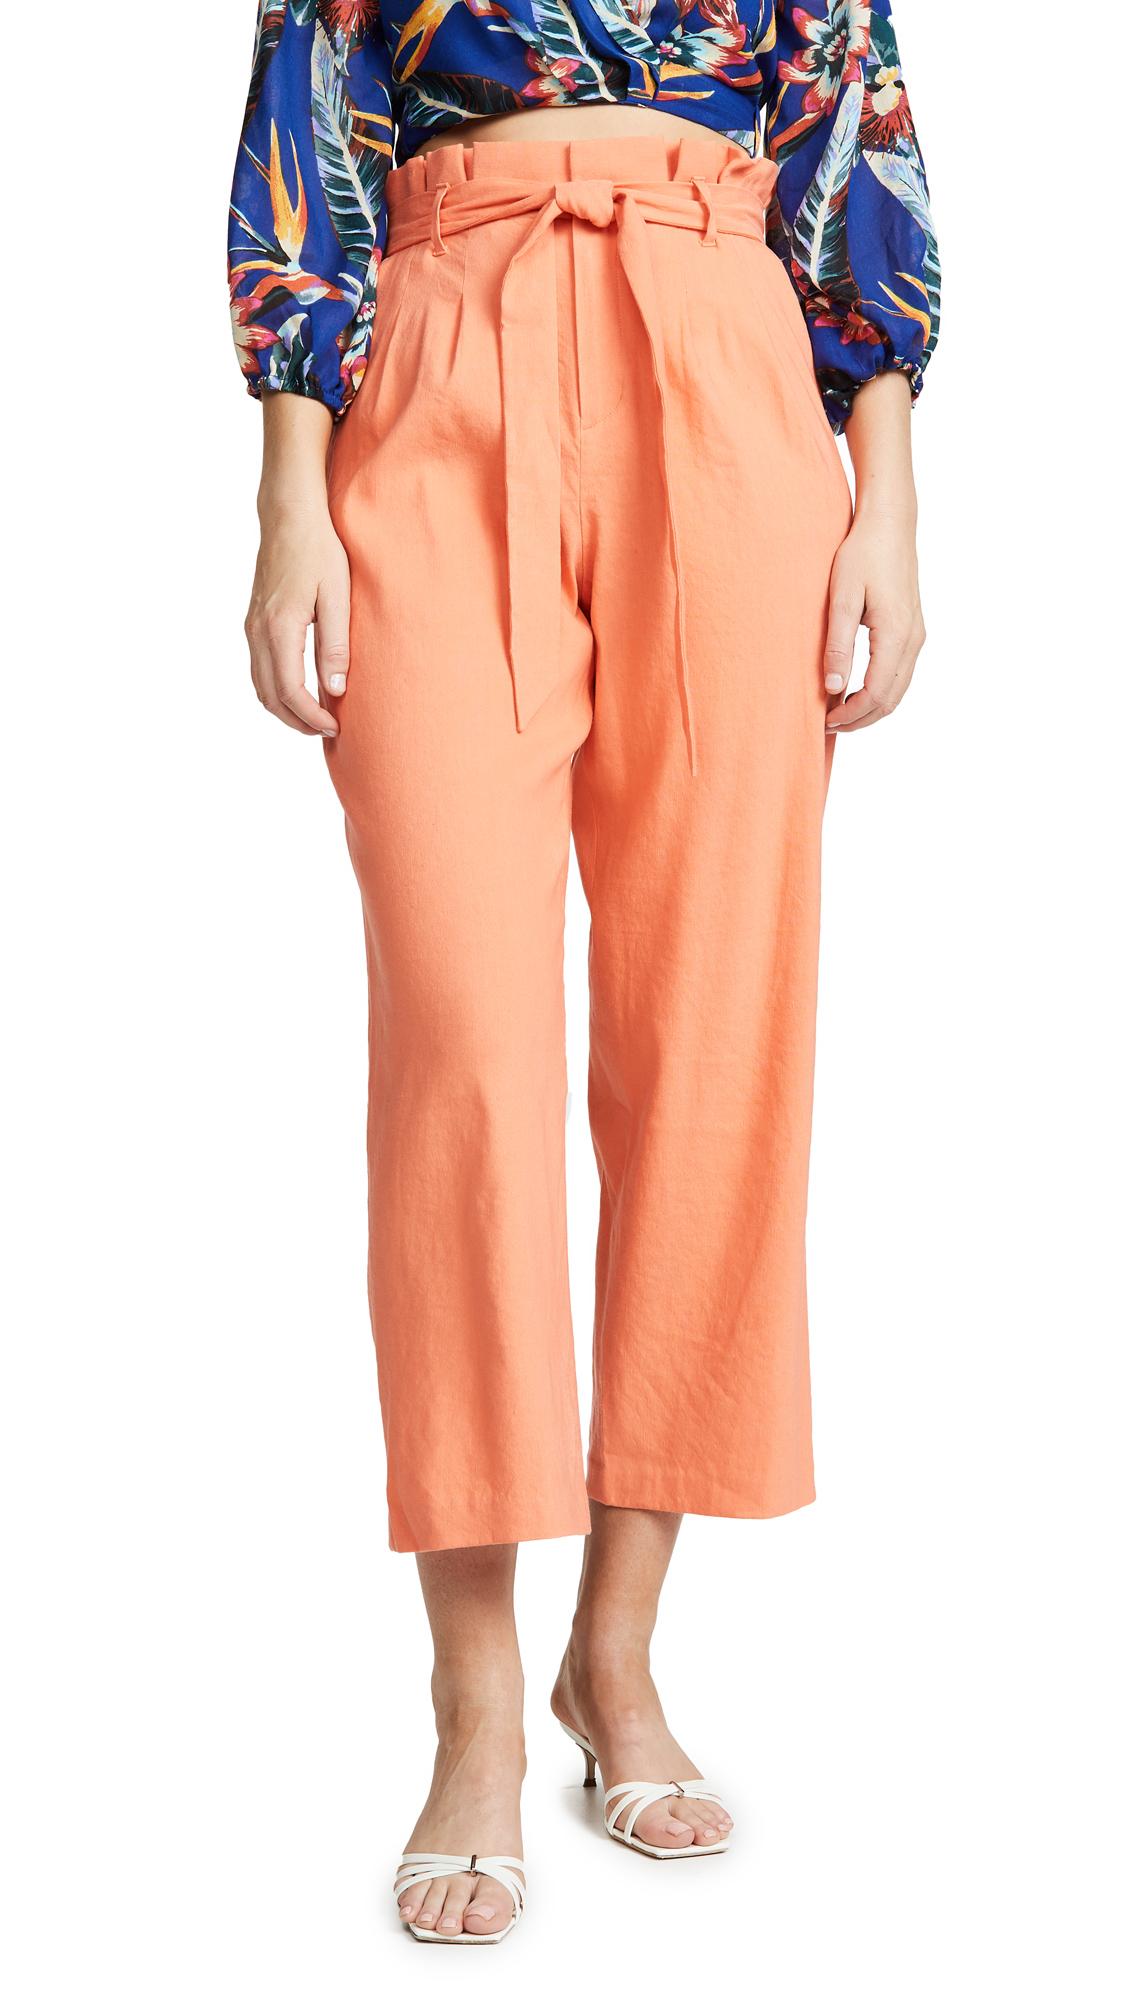 alice + olivia Farrel Paper Bag Pleated Pants - Coral